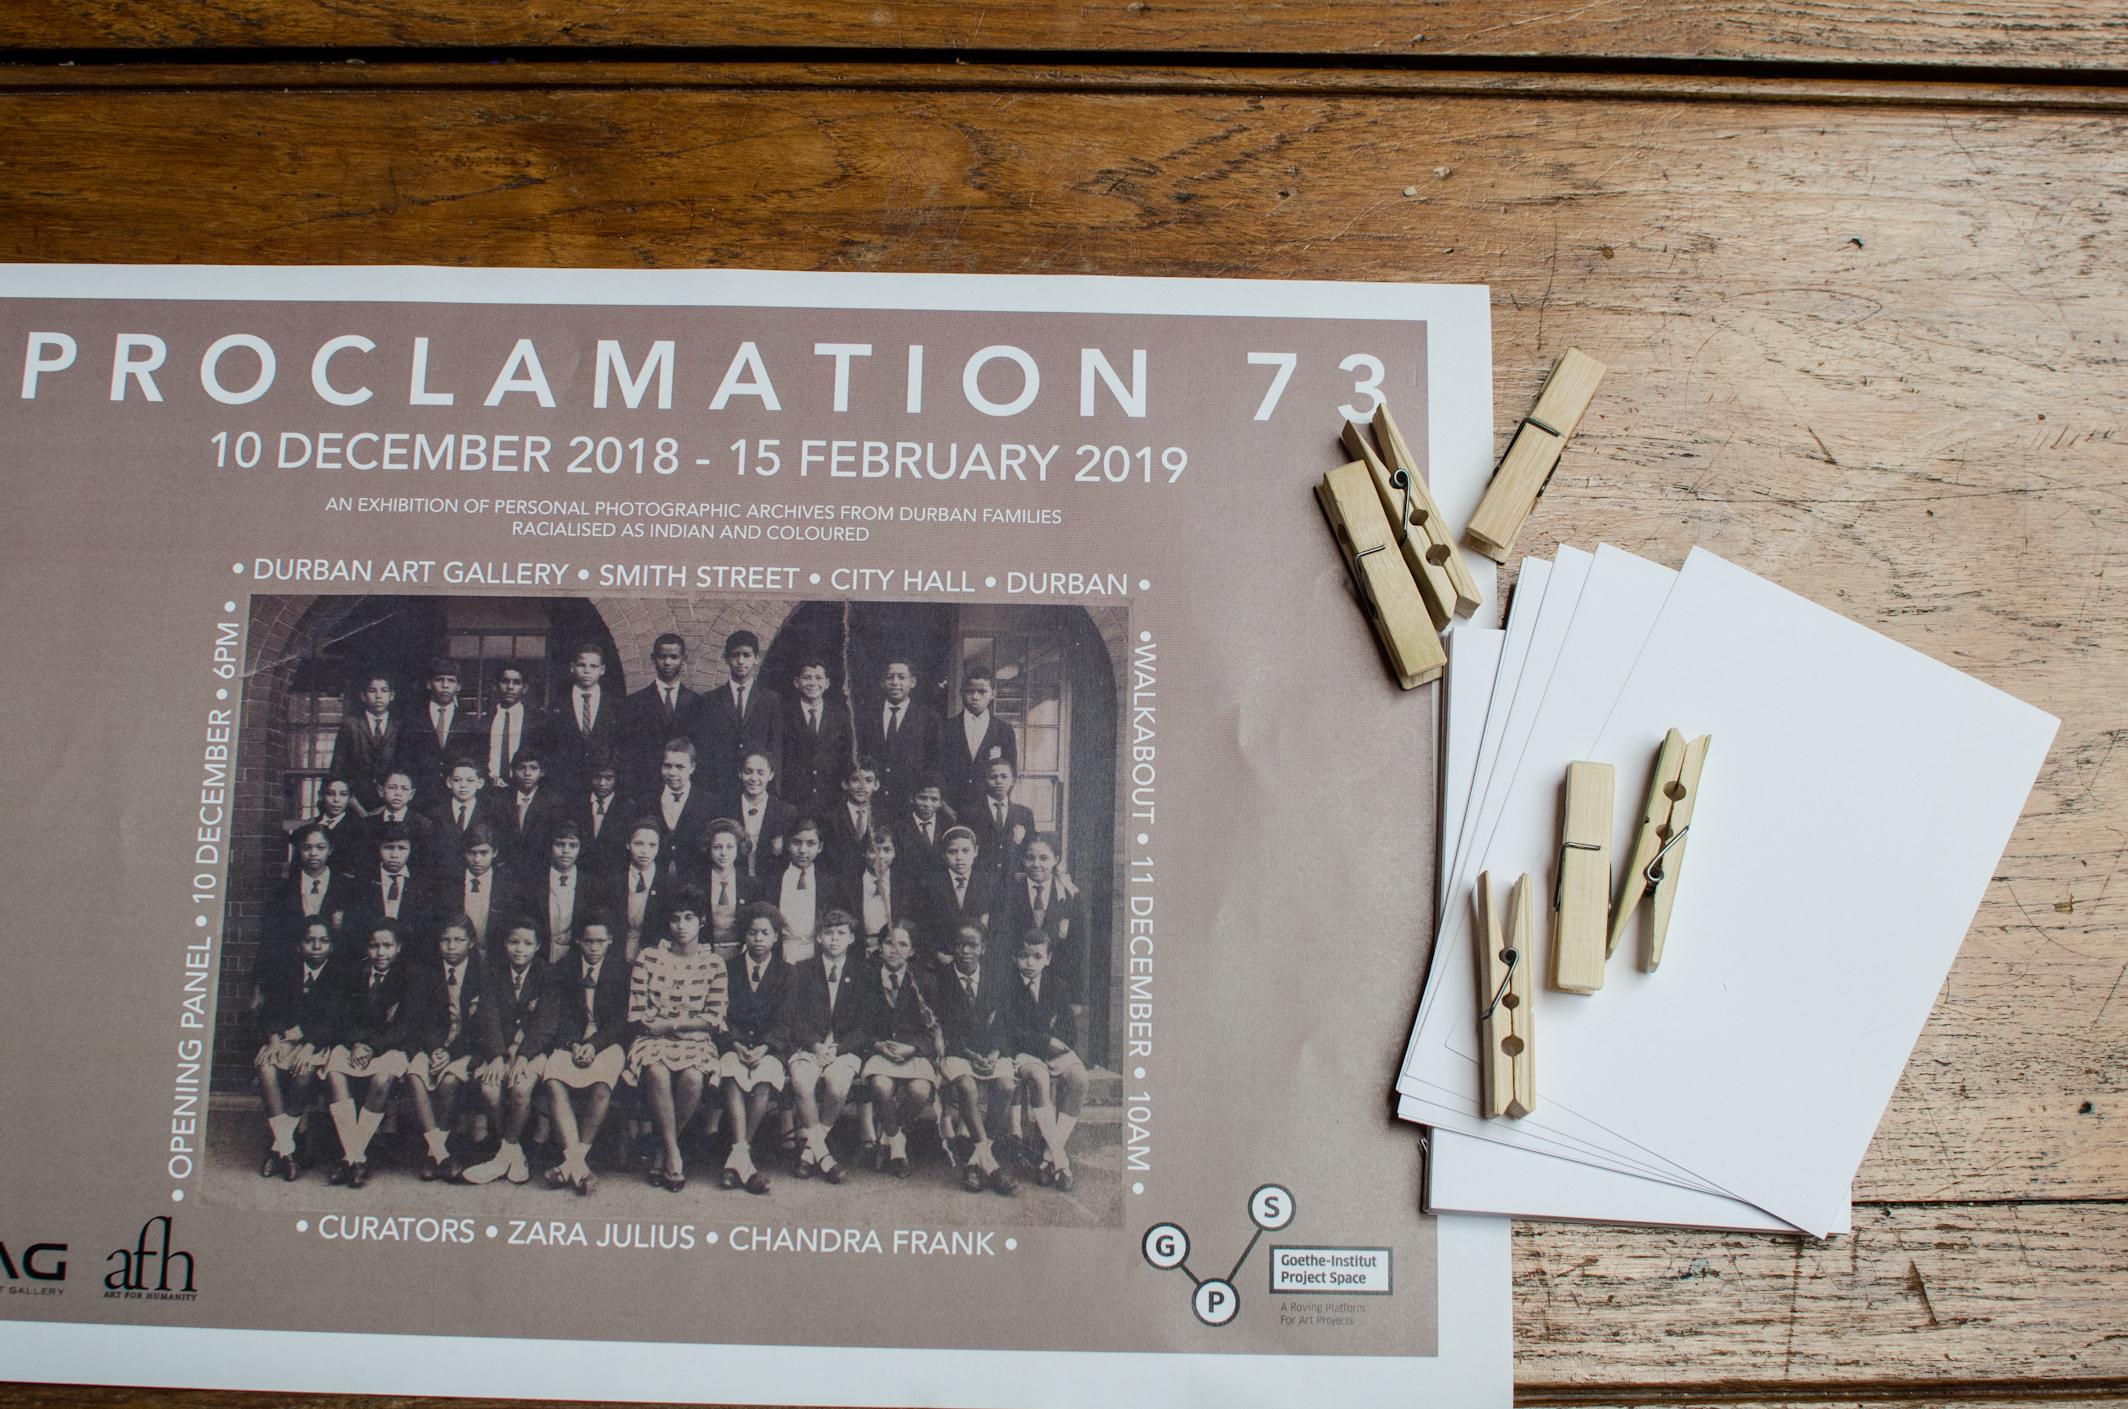 Proclamation73